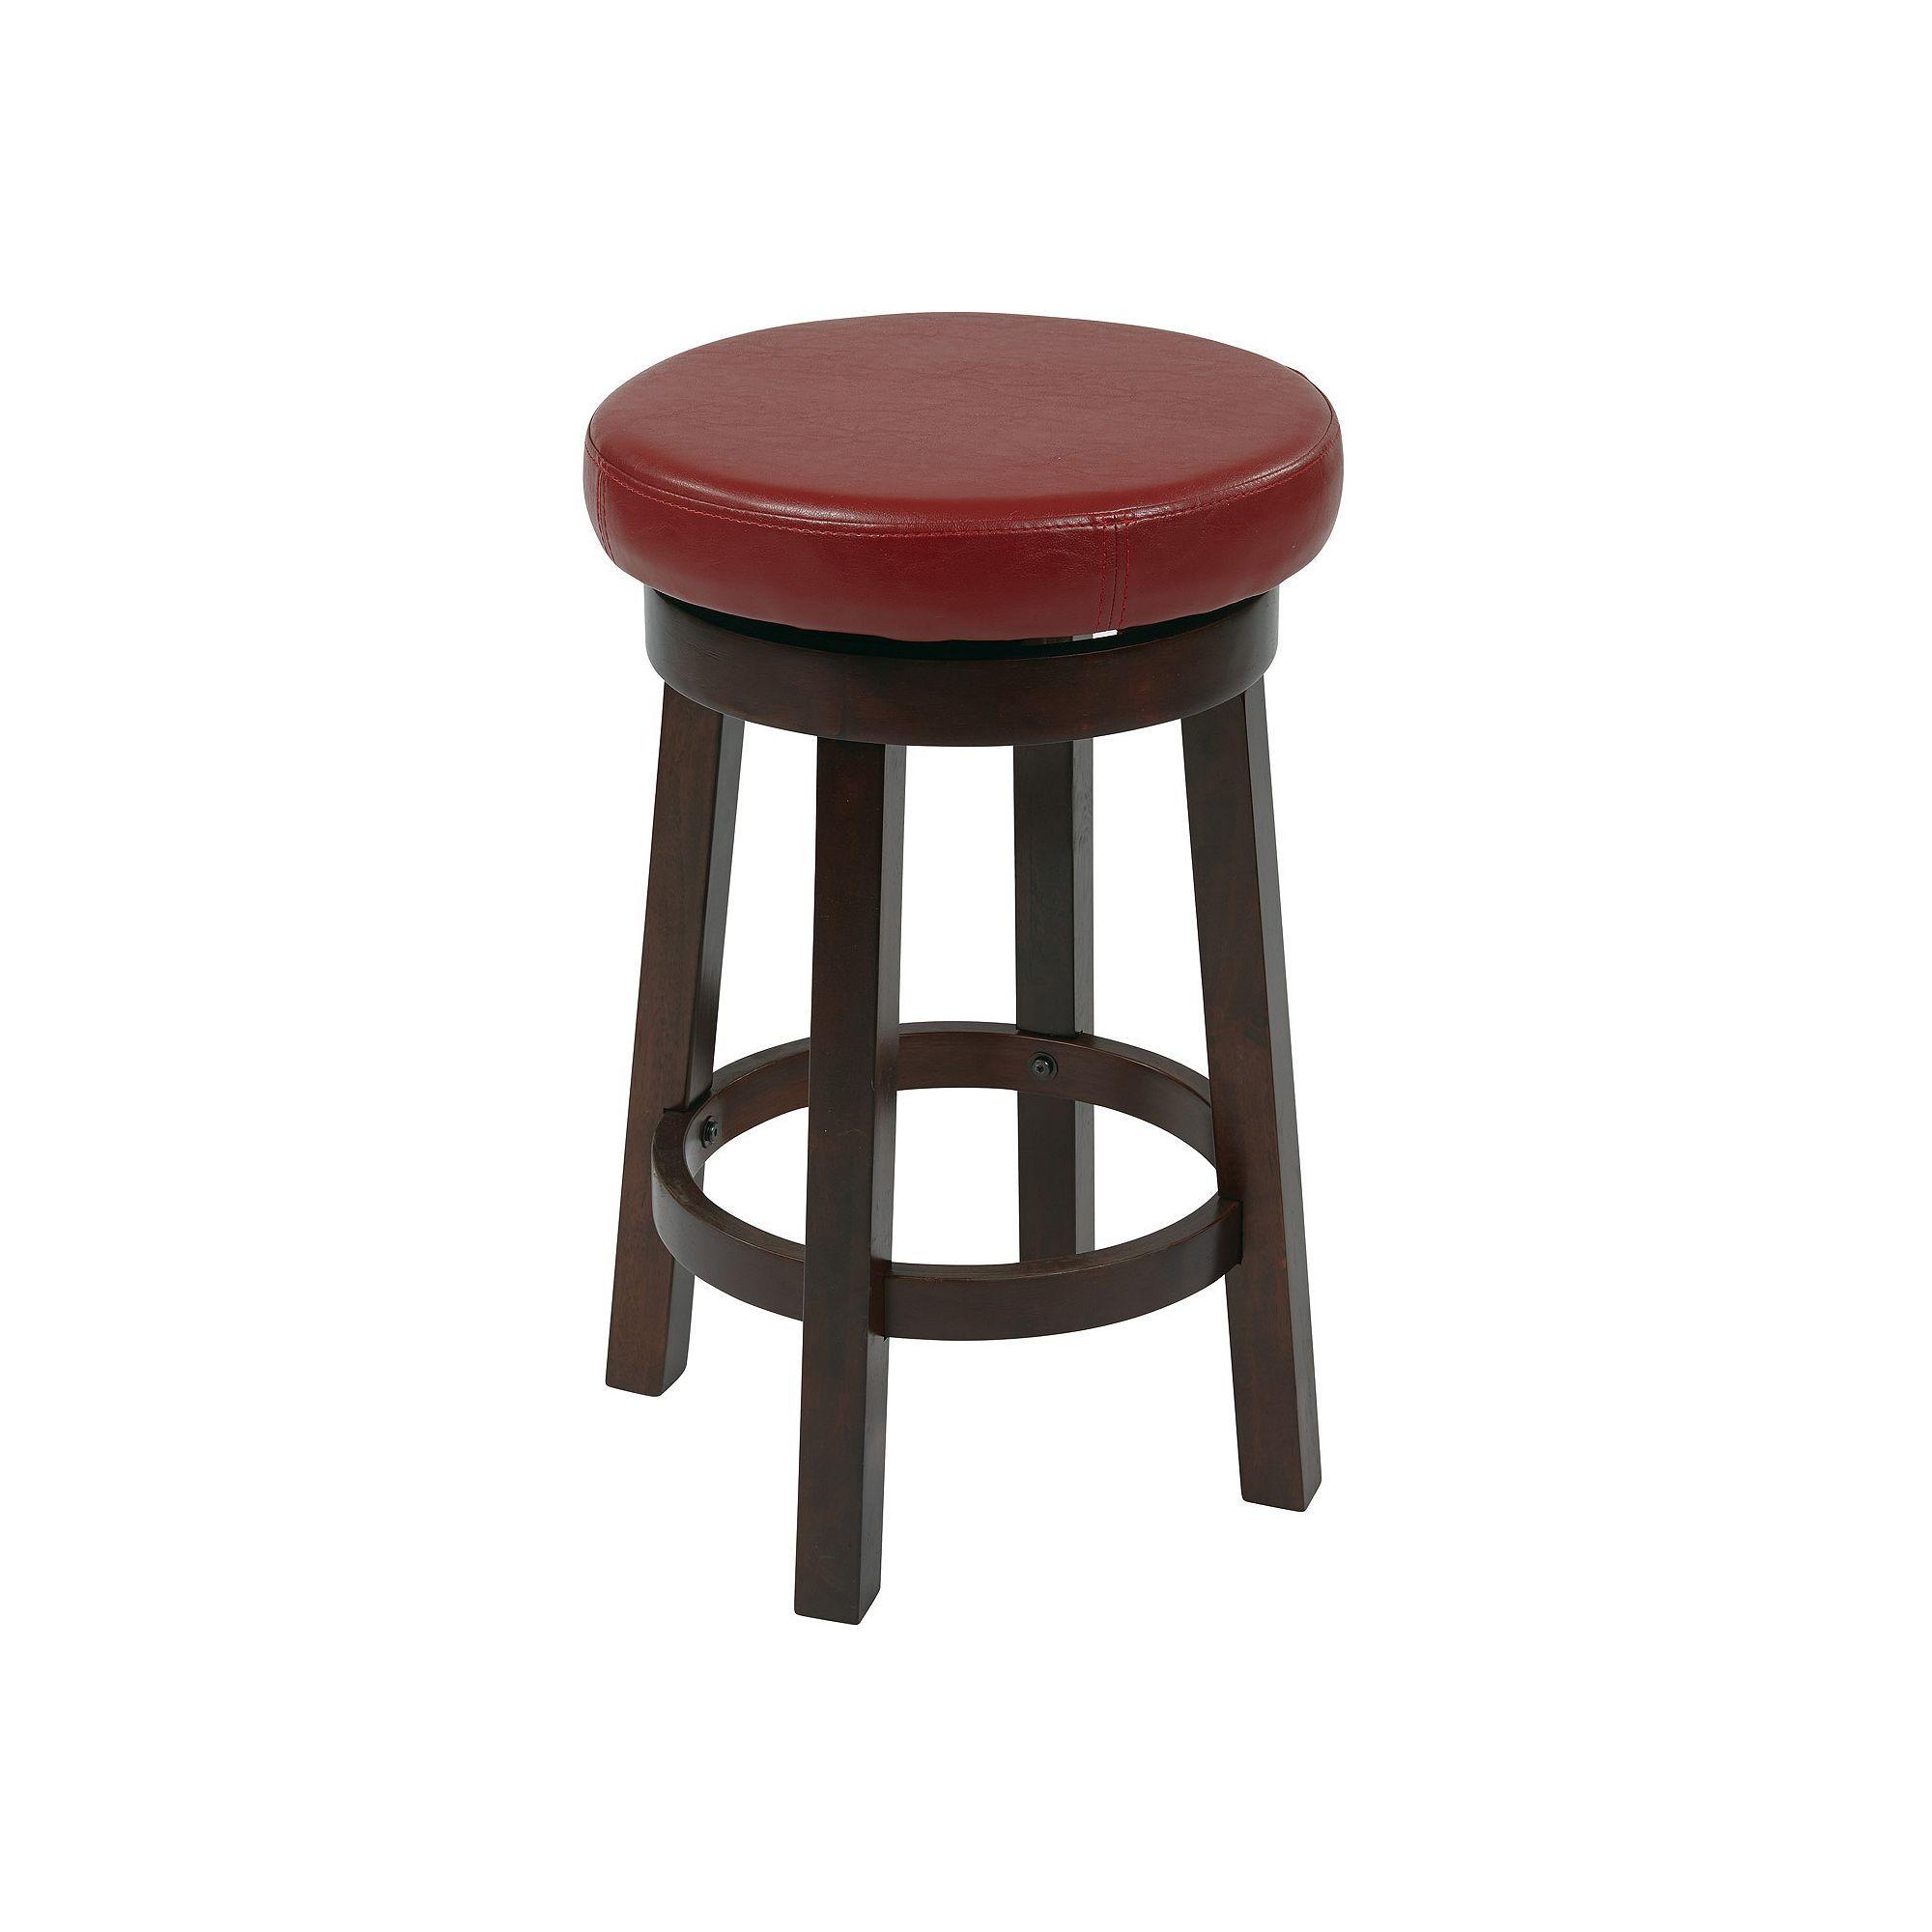 OSP Home Furnishings Metro Bar Stool Bar stools, 24 inch